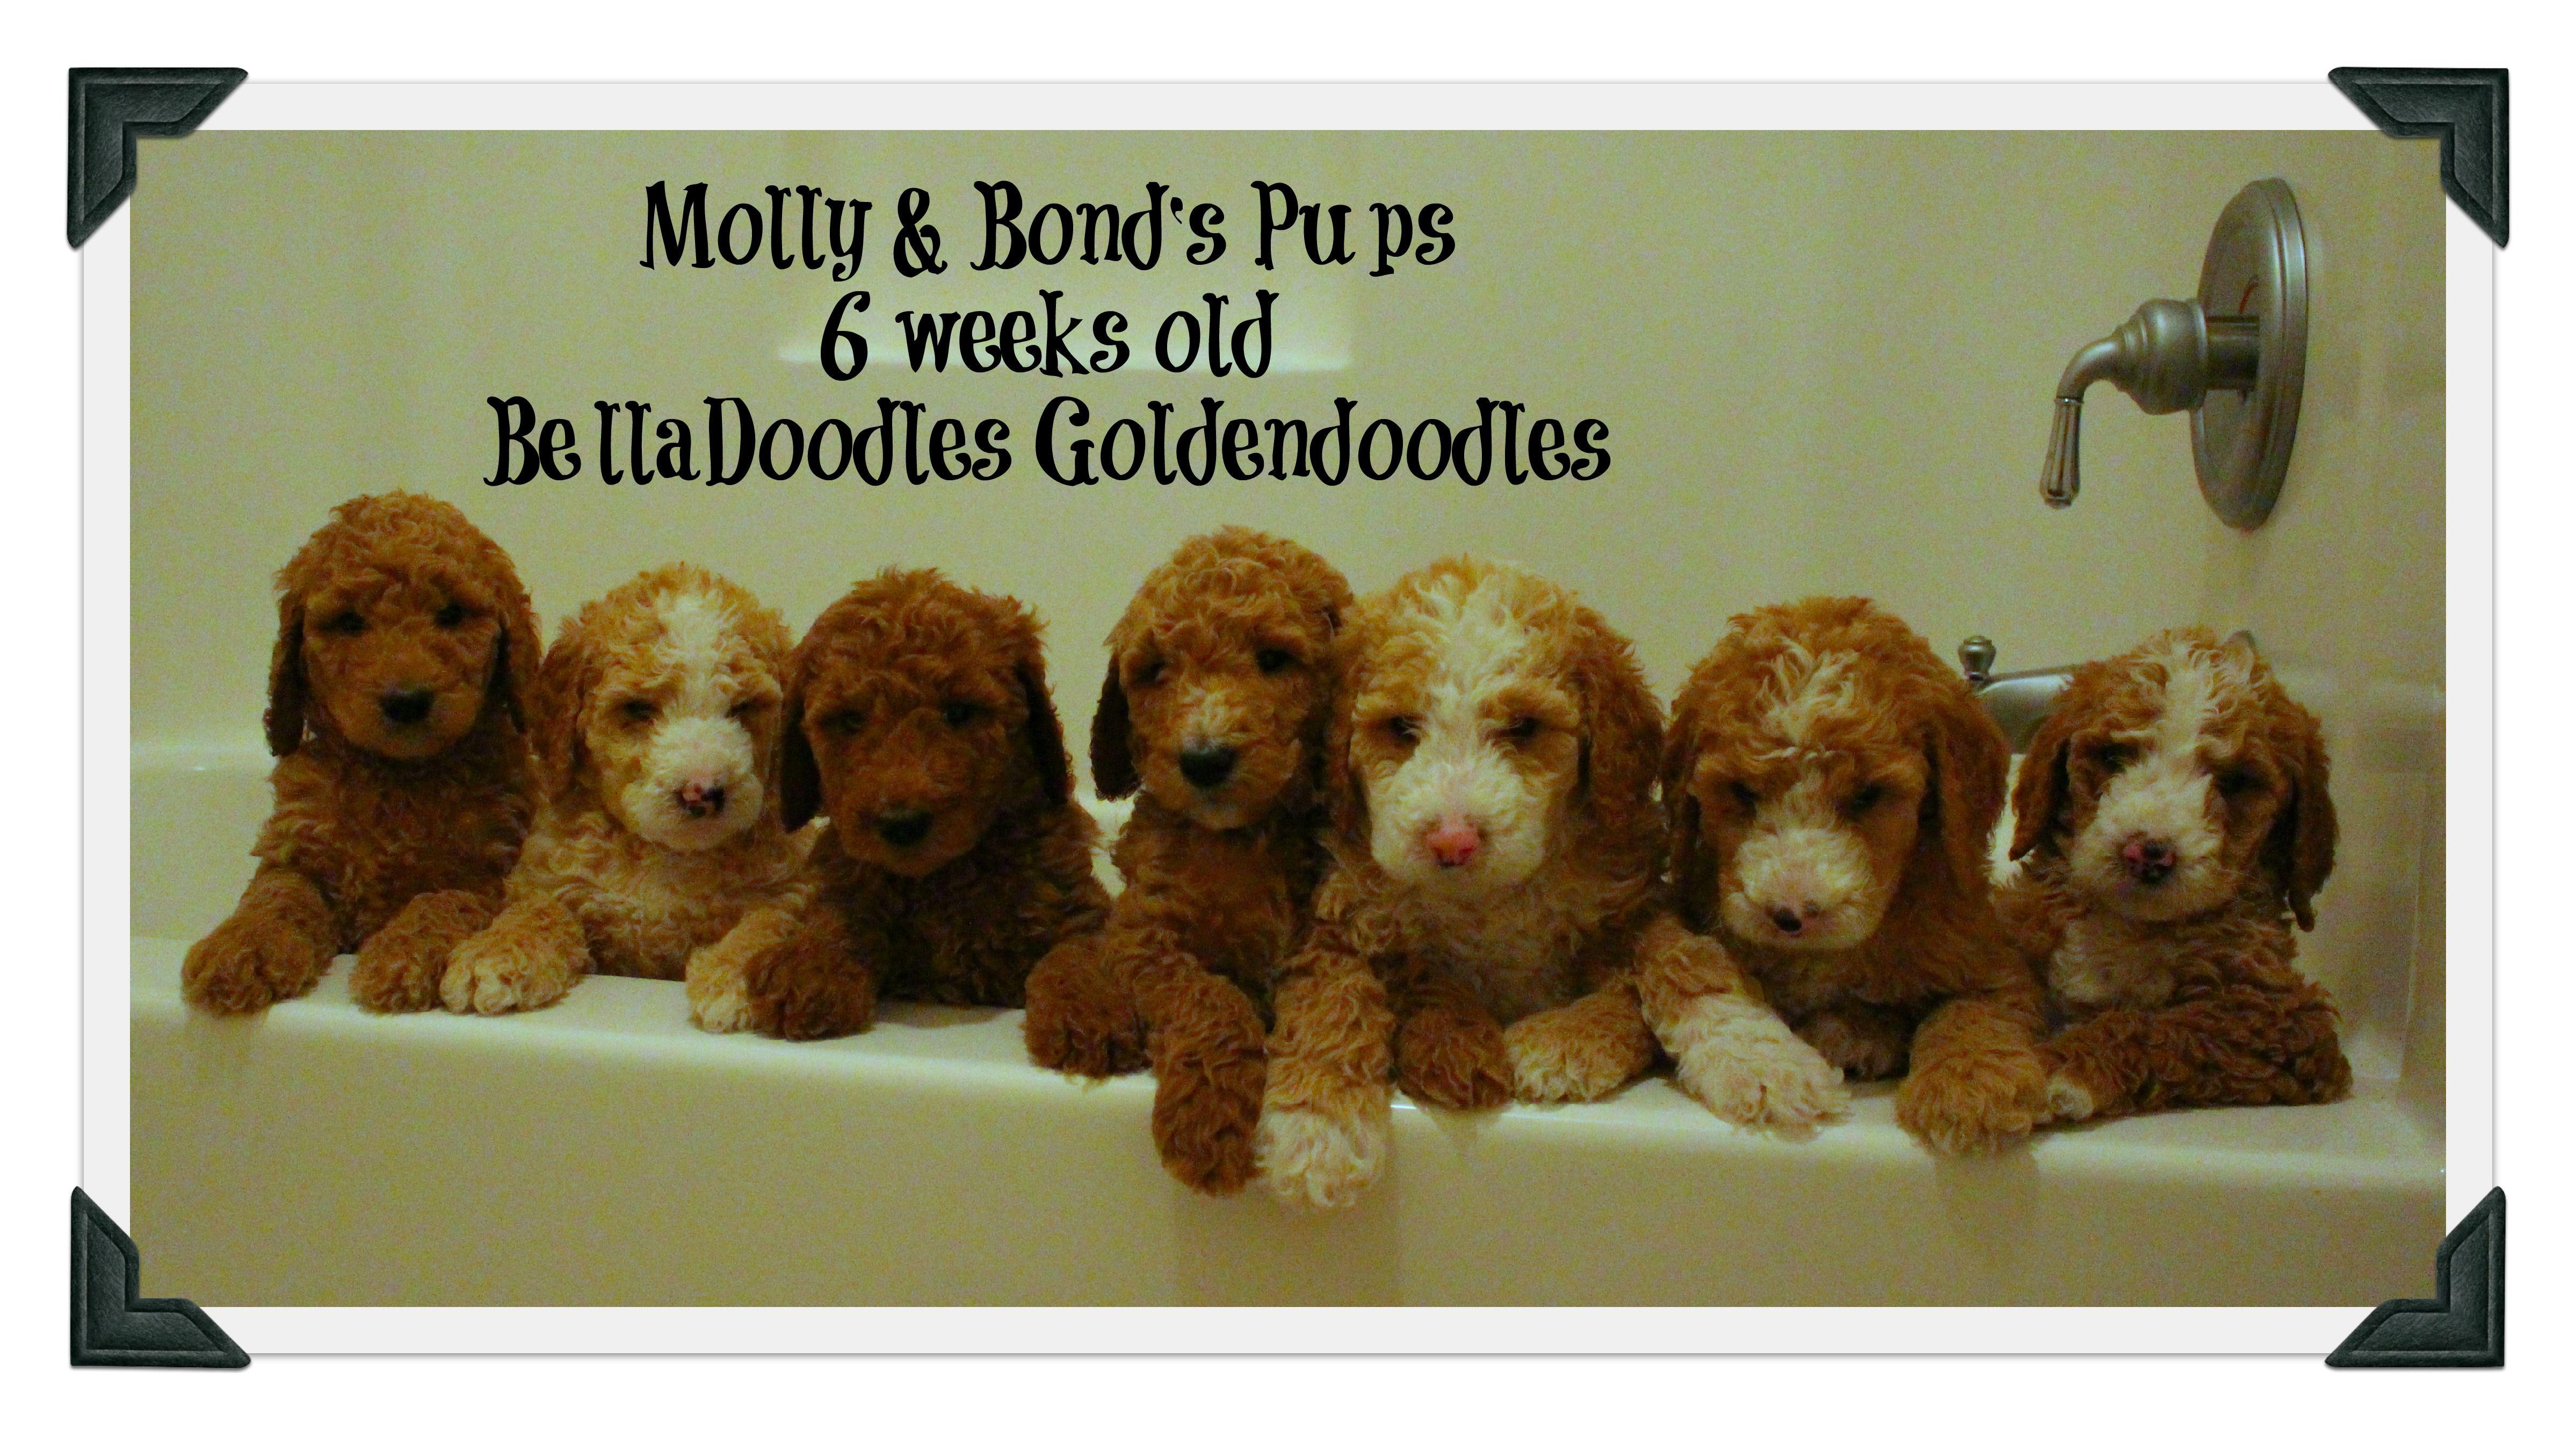 Belladoodles goldendoodles goldendoodle goldendoodle